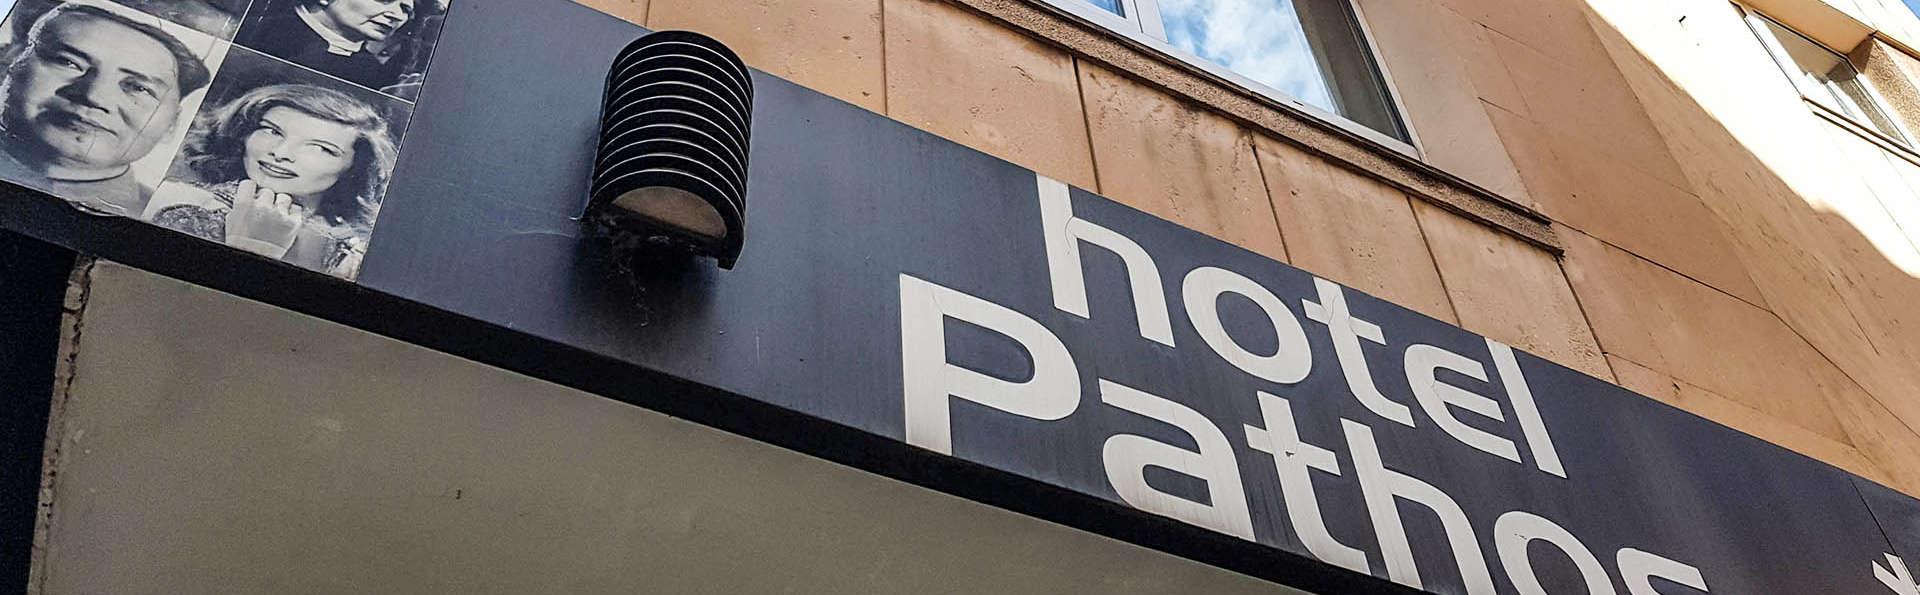 Hotel City House Pathos - EDIT_Fachada_01.jpg